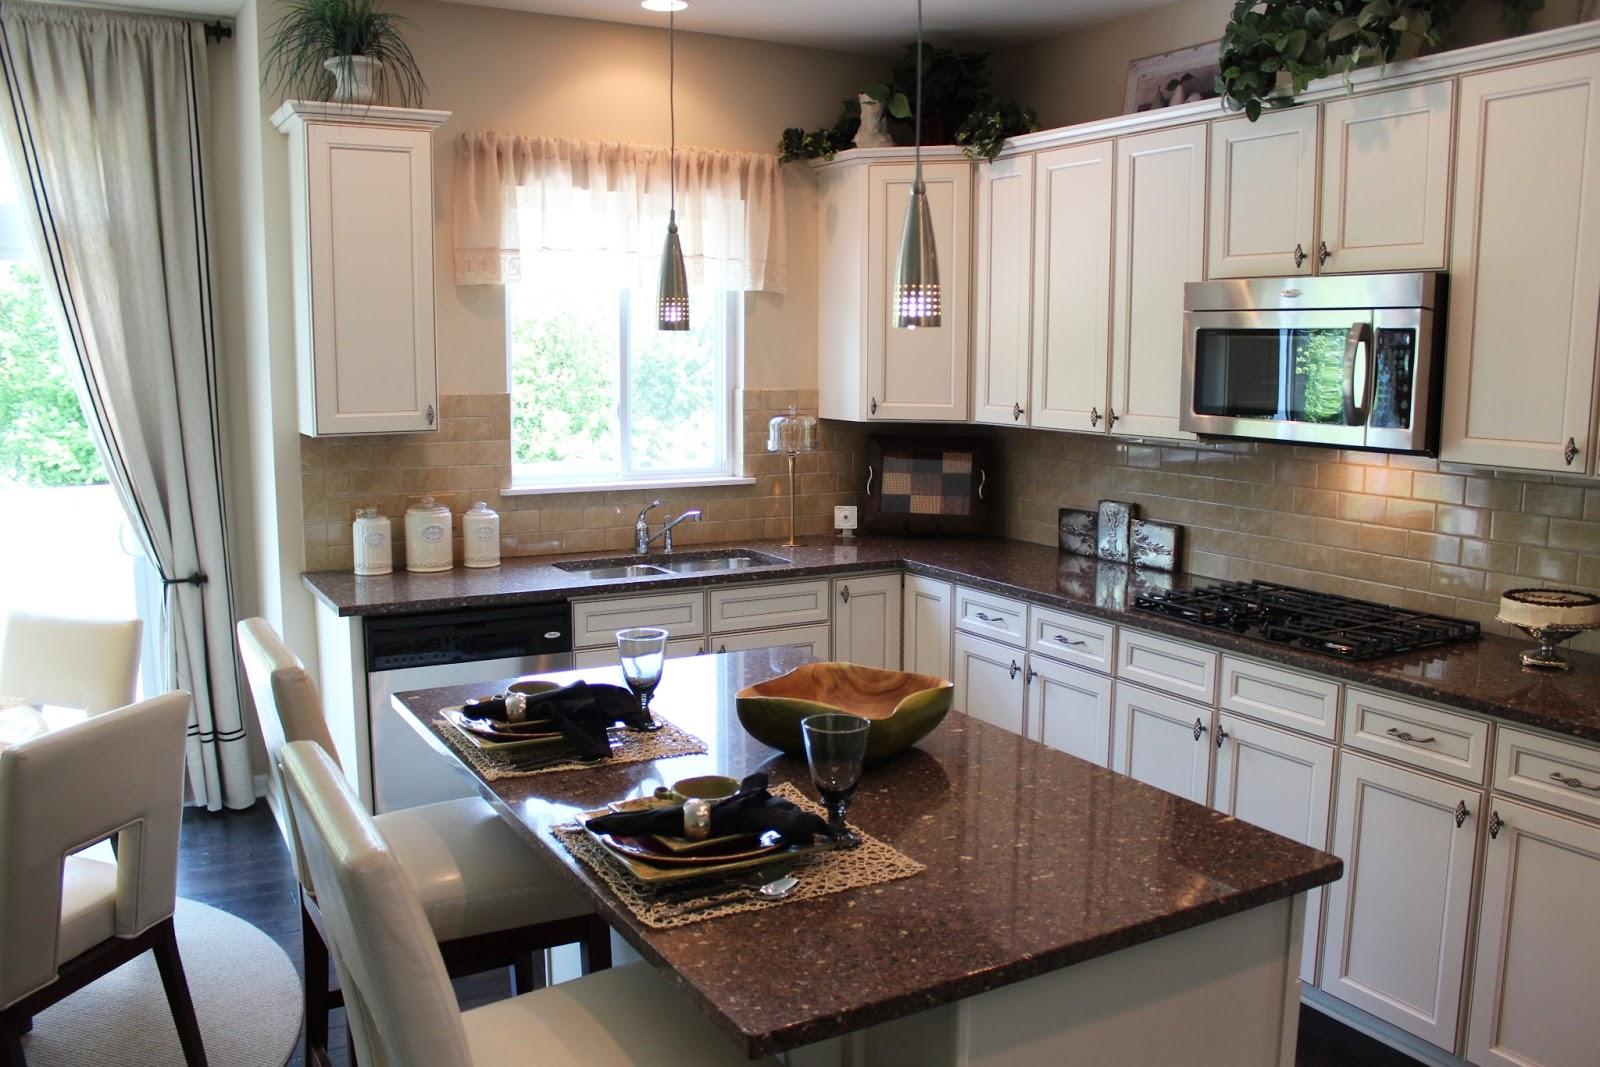 Klm builders inc updating your kitchen popular design for Updating kitchen ideas